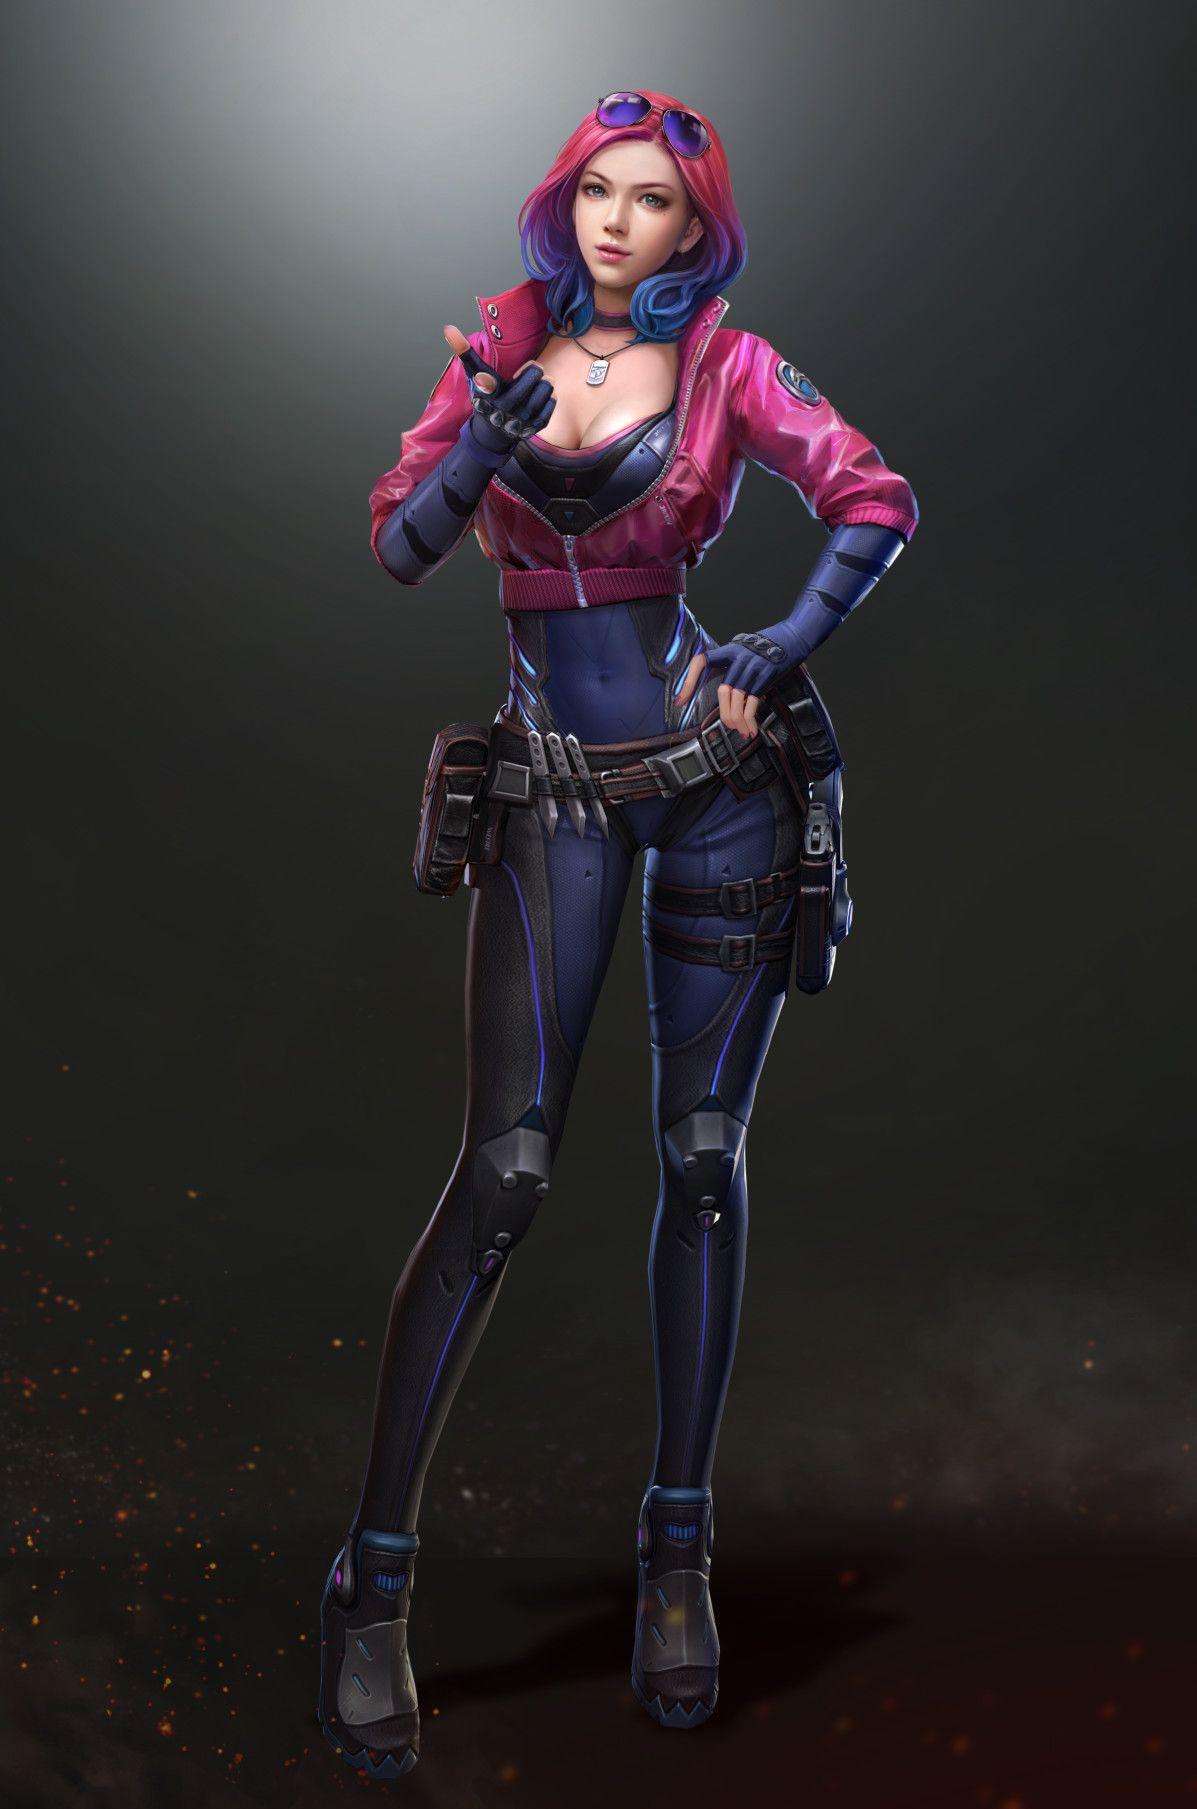 ArtStation 全民突击 wefire 小师妹 人物宣传, tian zi Cyberpunk